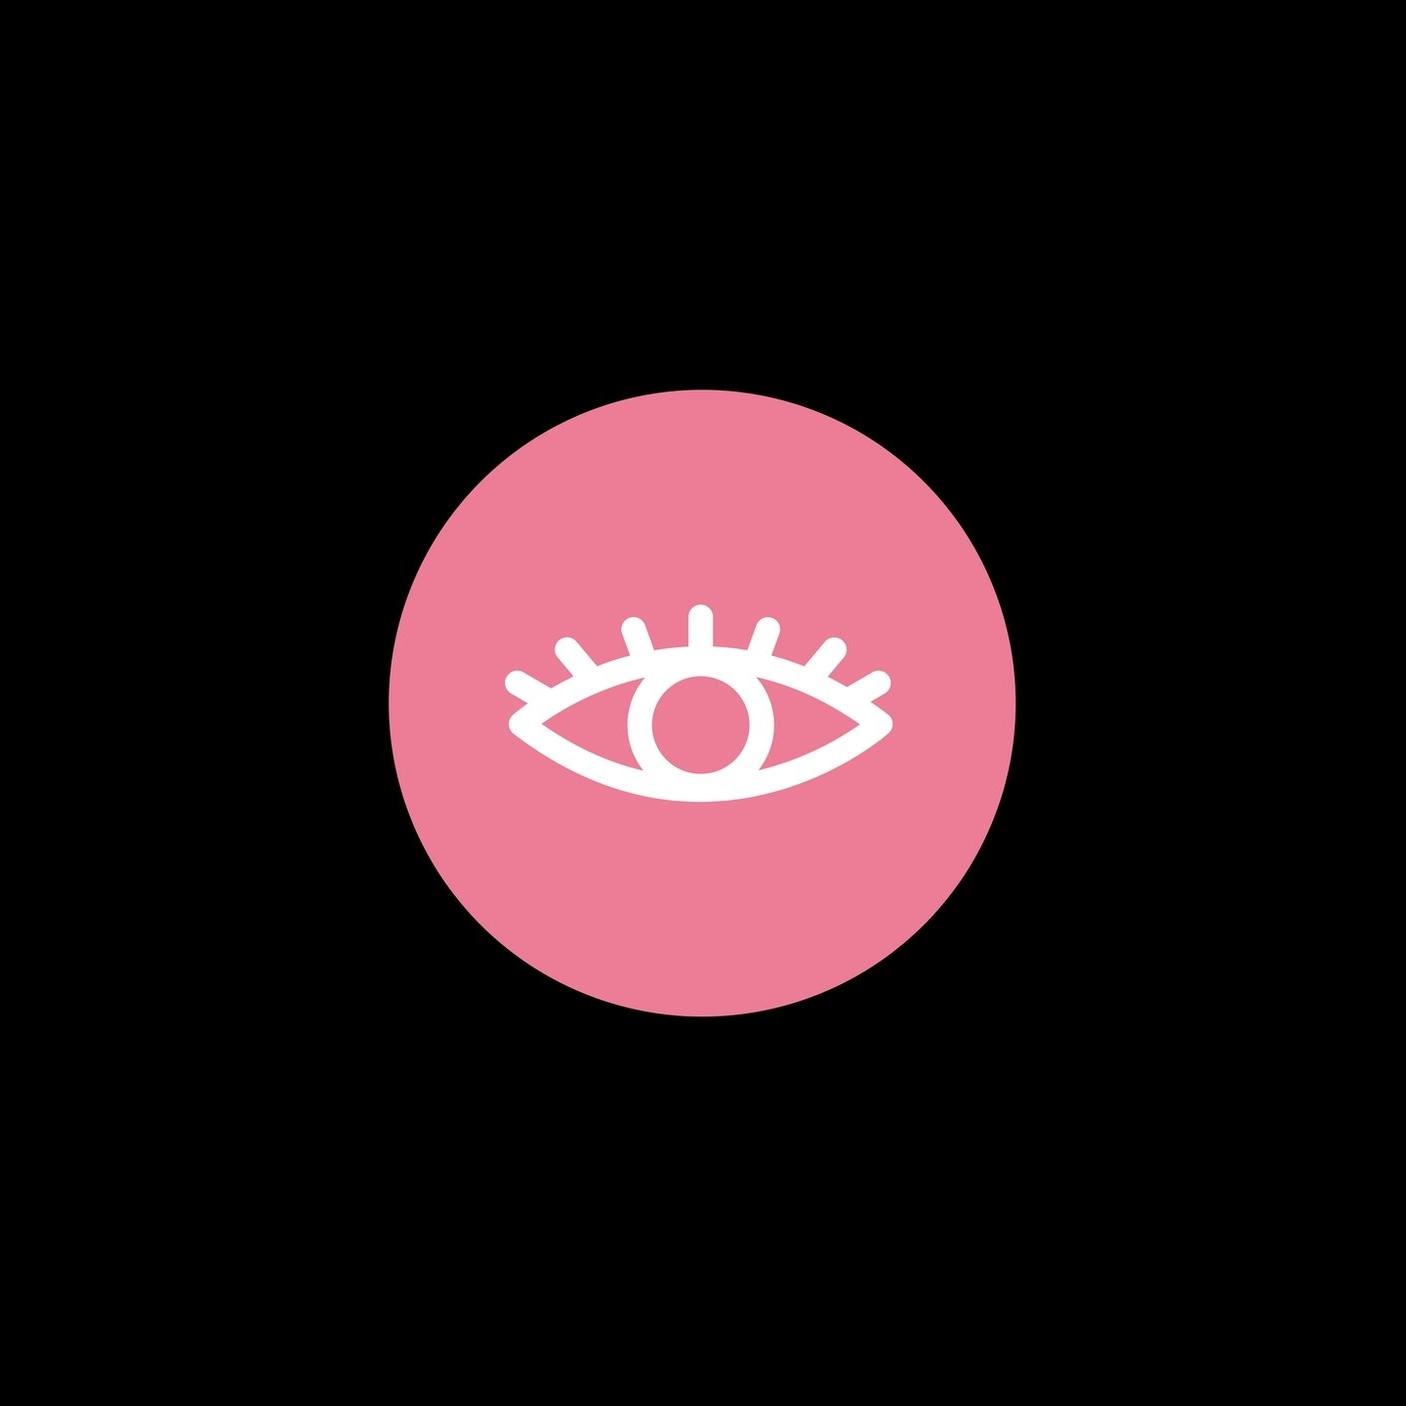 Blue Pink Circles Beauty Makeup Youtube Channel Art (2).jpg